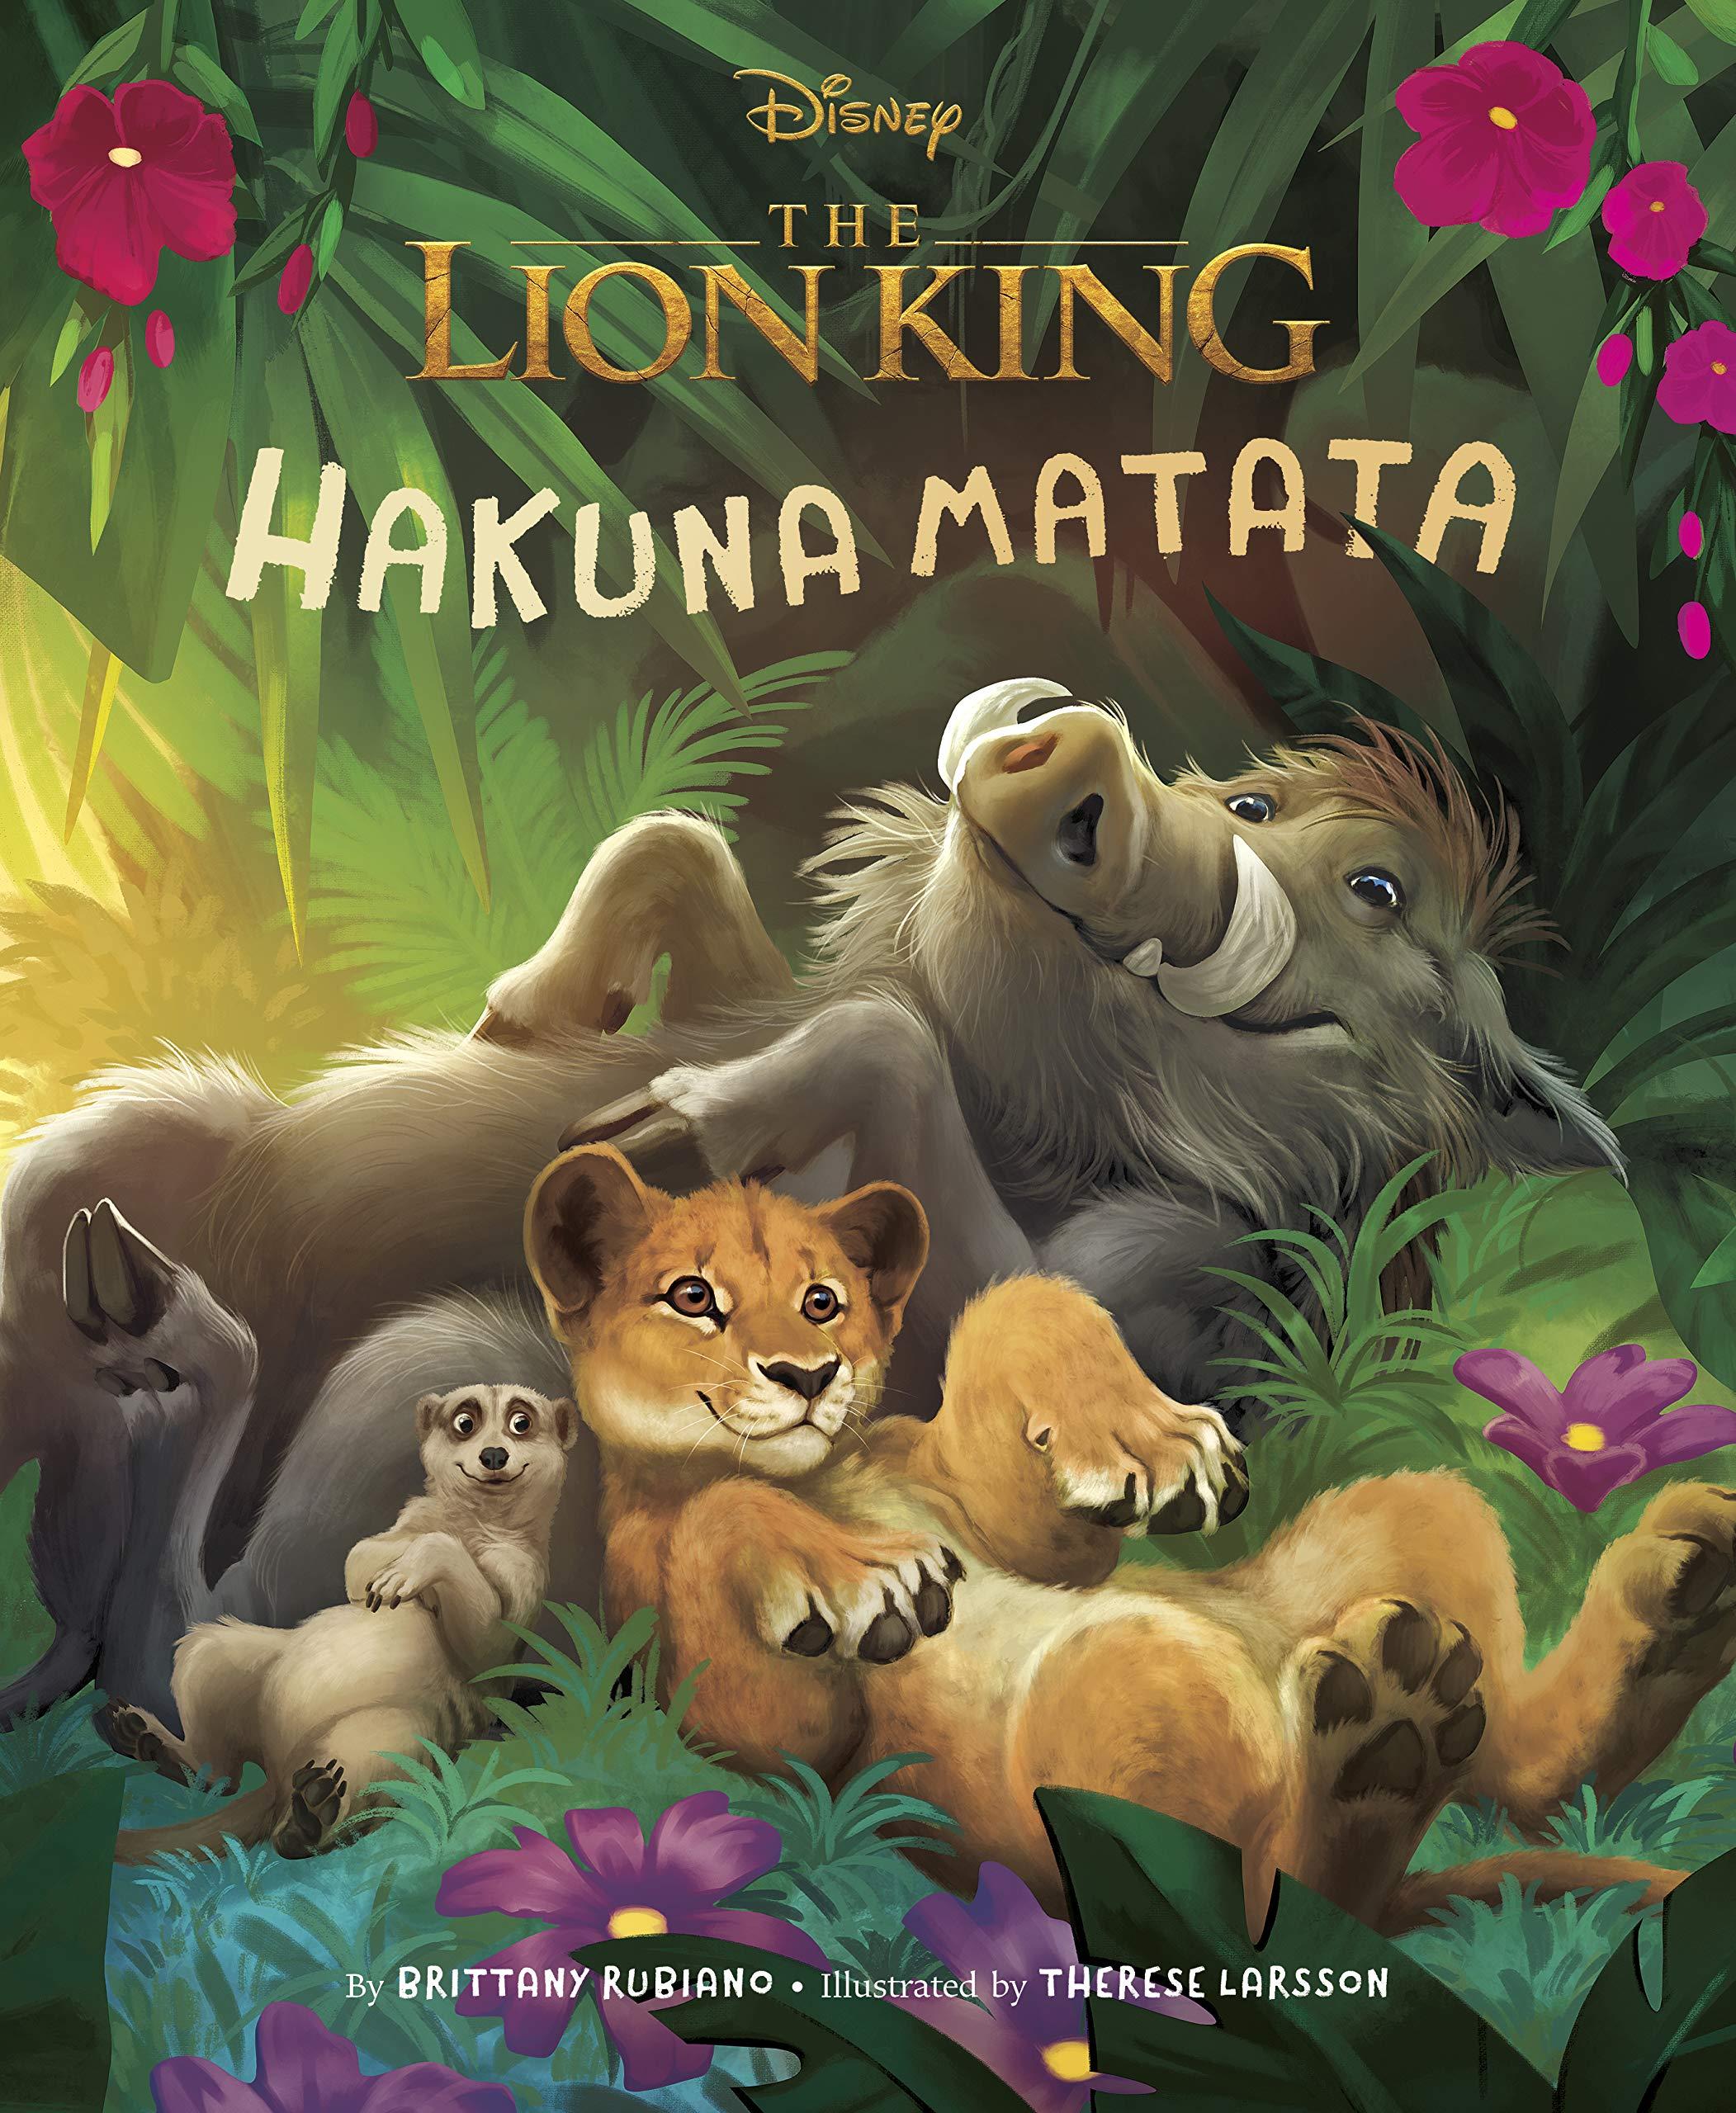 Lion King (2019) Picture Book, The: Hakuna Matata